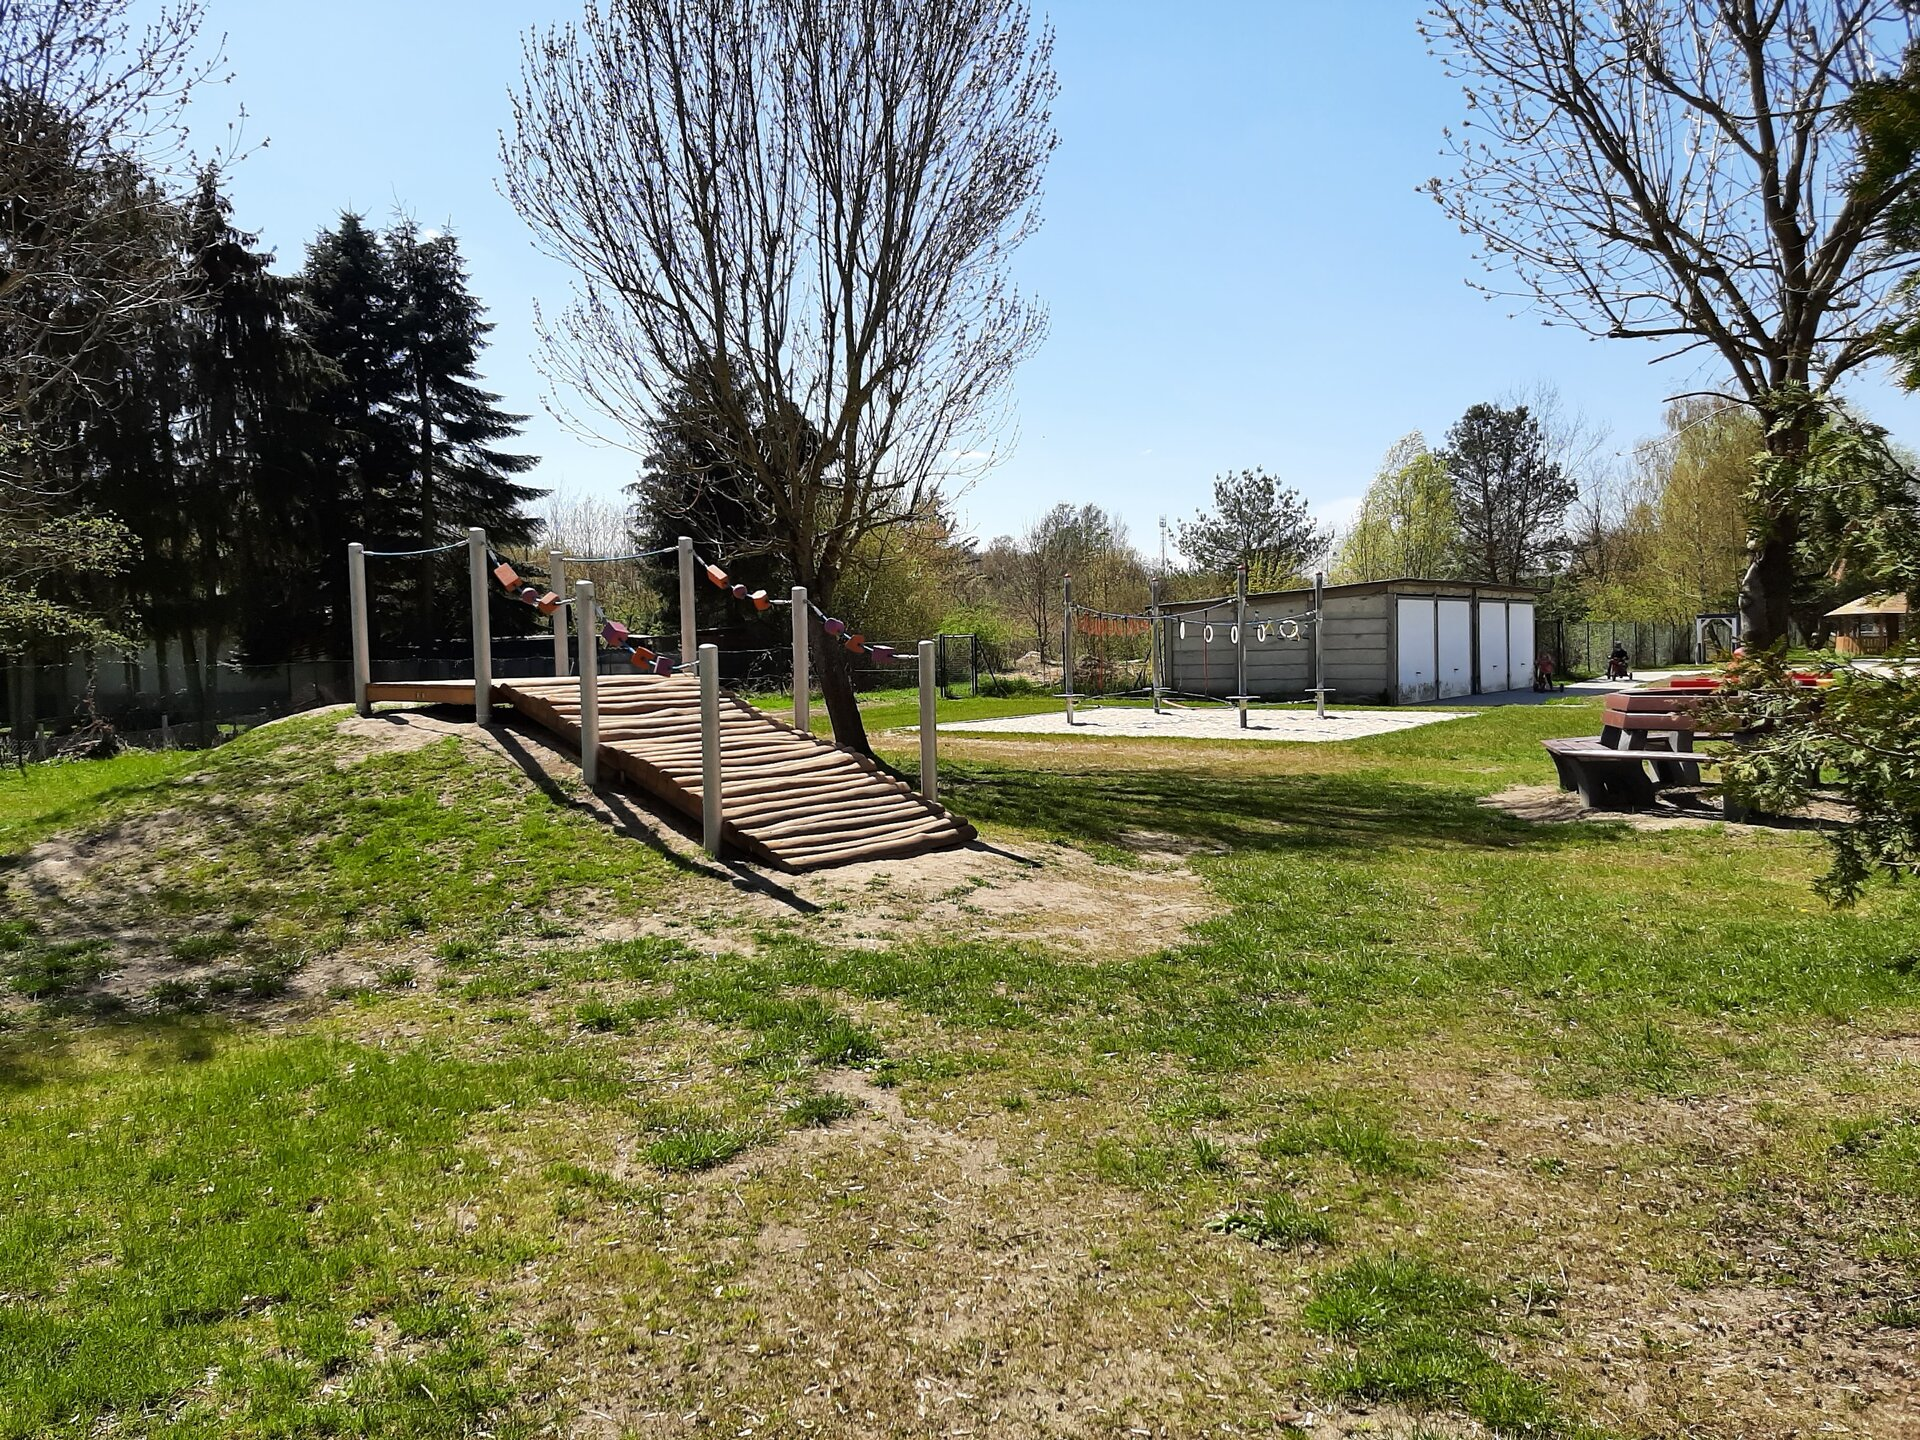 Garten der Kita Rappelkiste